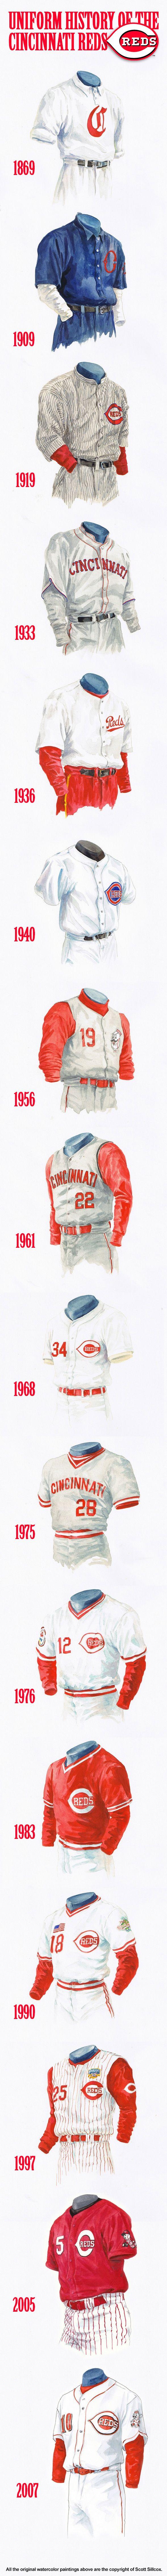 The Uniform History of the Cincinnati Reds #cincinnatireds #reds